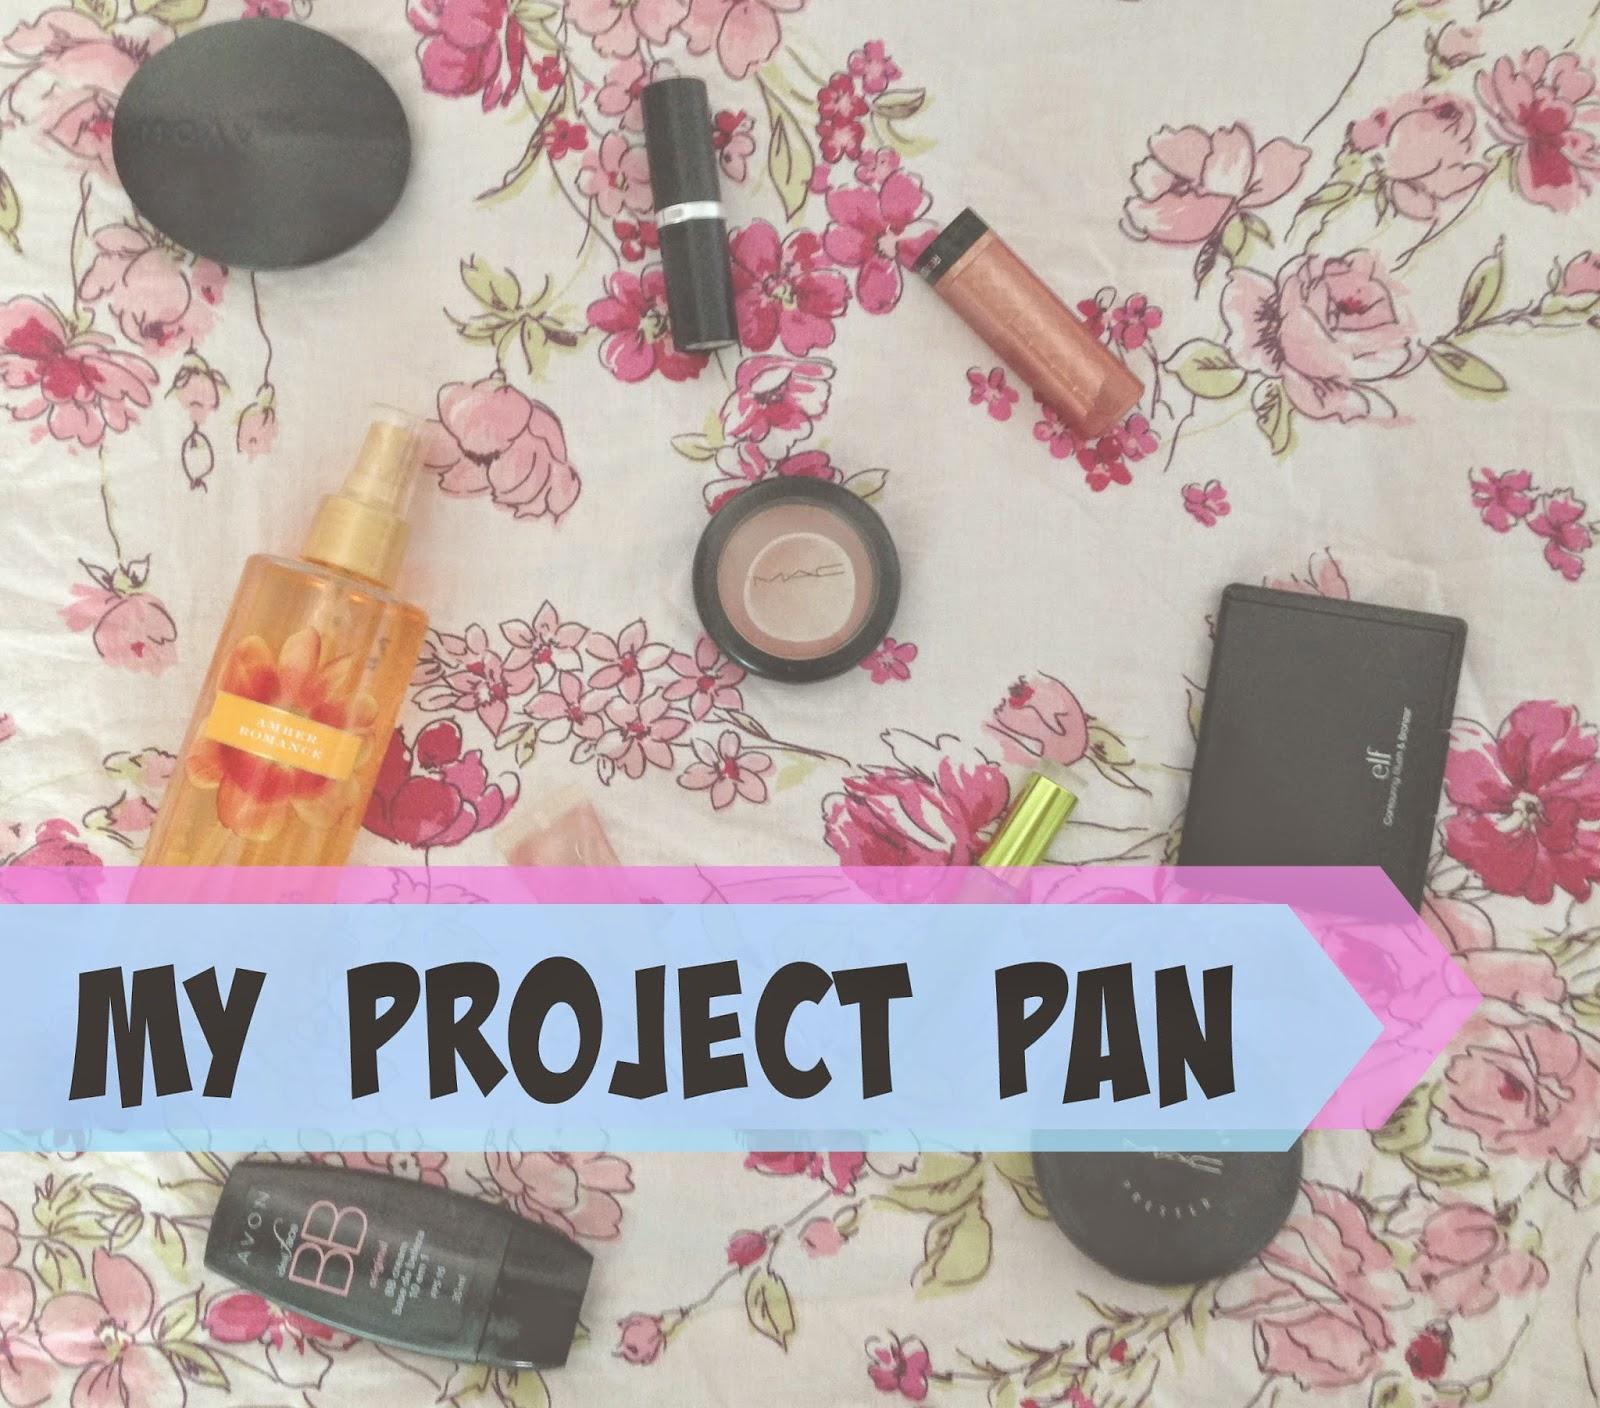 Letmecrossover_project_pan_ten_10_beauty_blog_products_mac_vc_avon_revlon_lip_butter